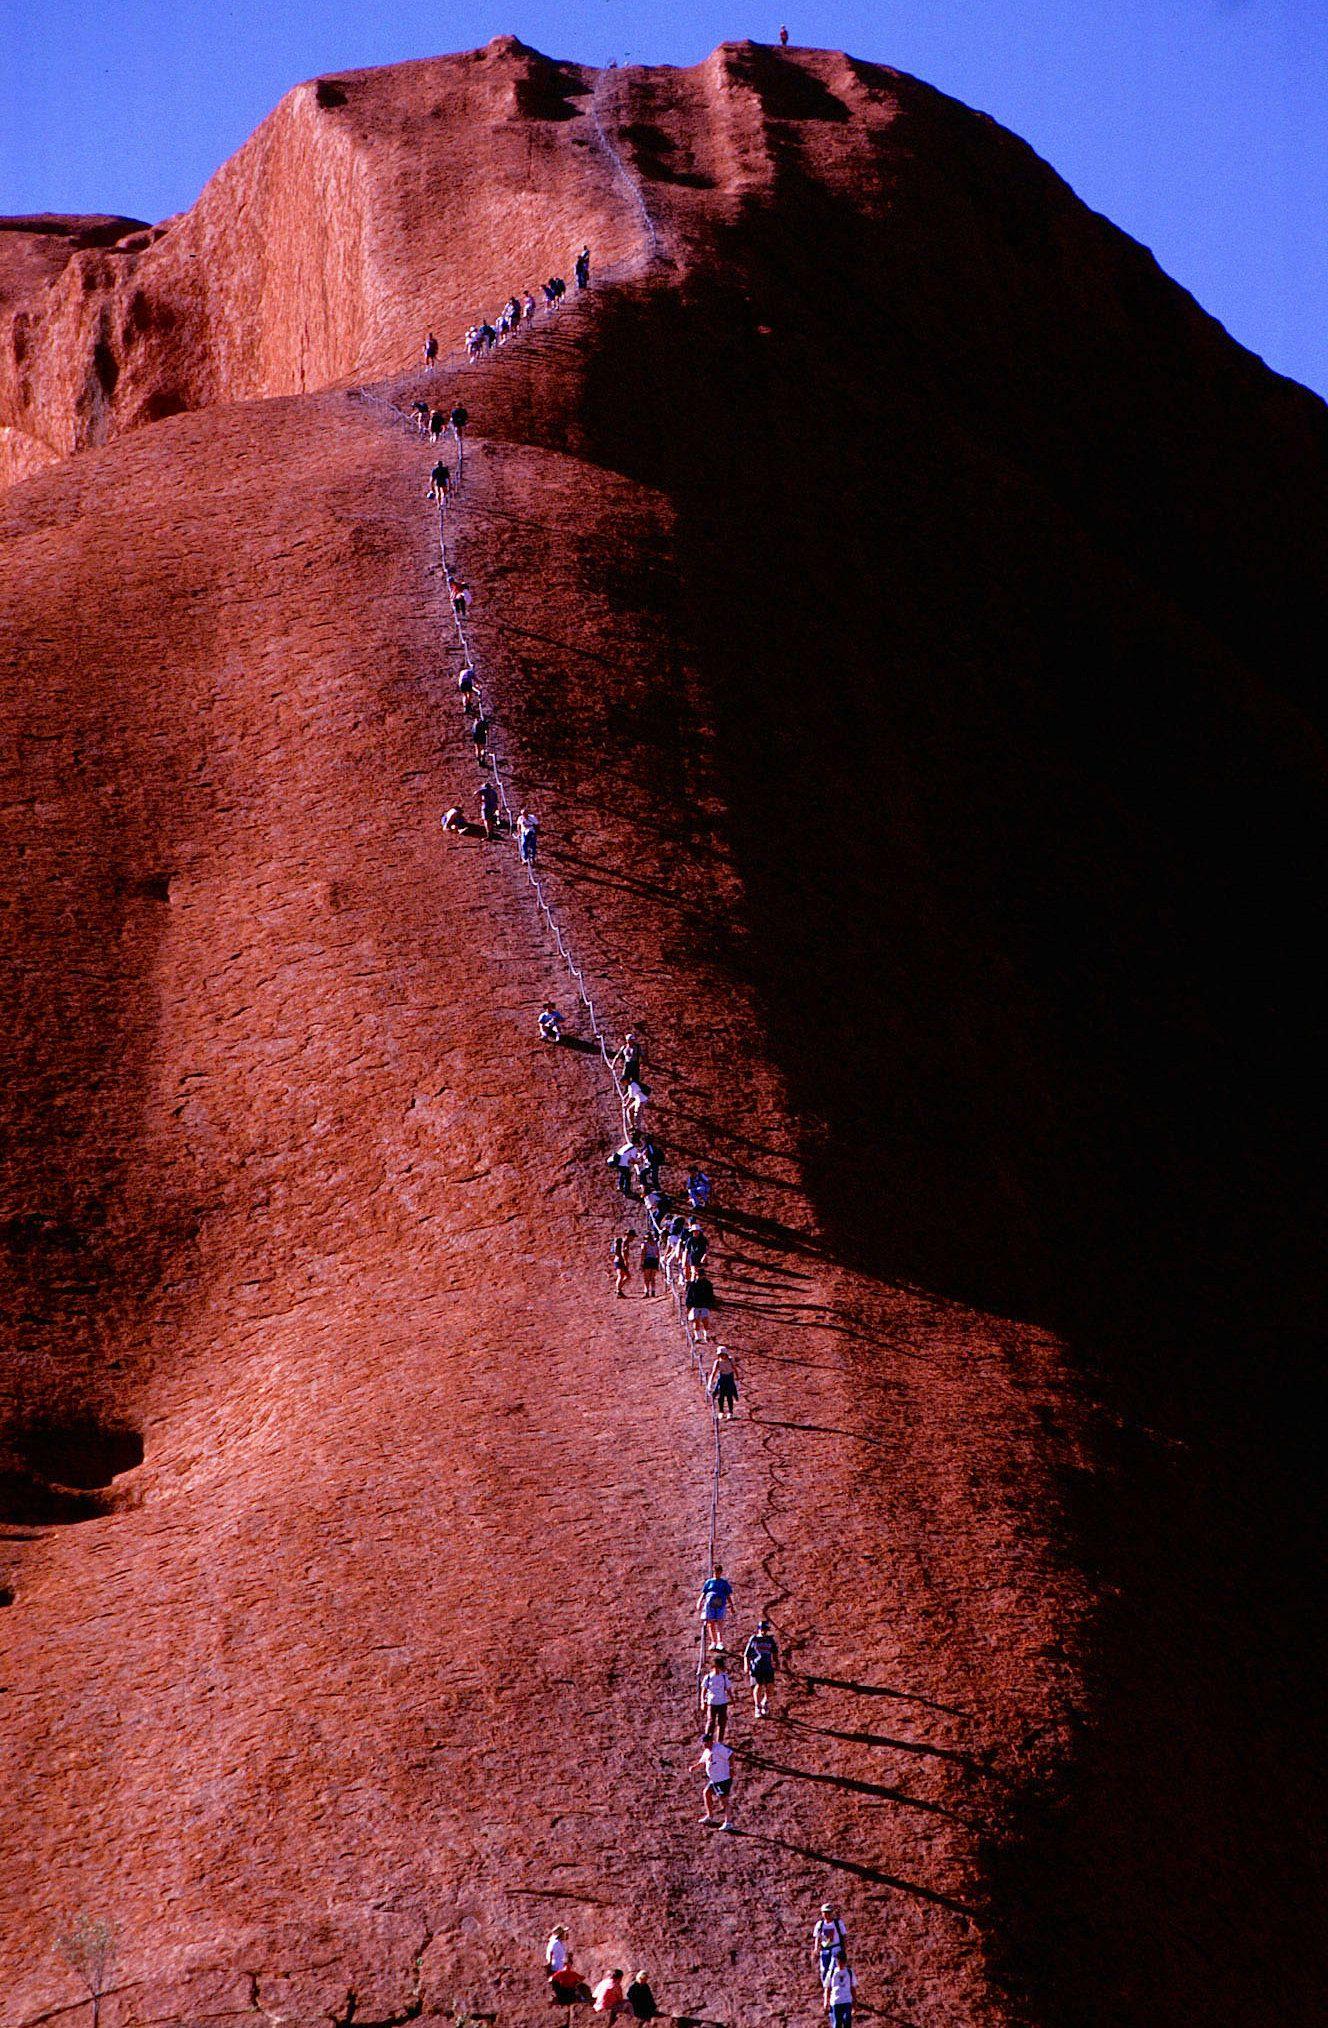 Ayers Rock / Uluru / Australien